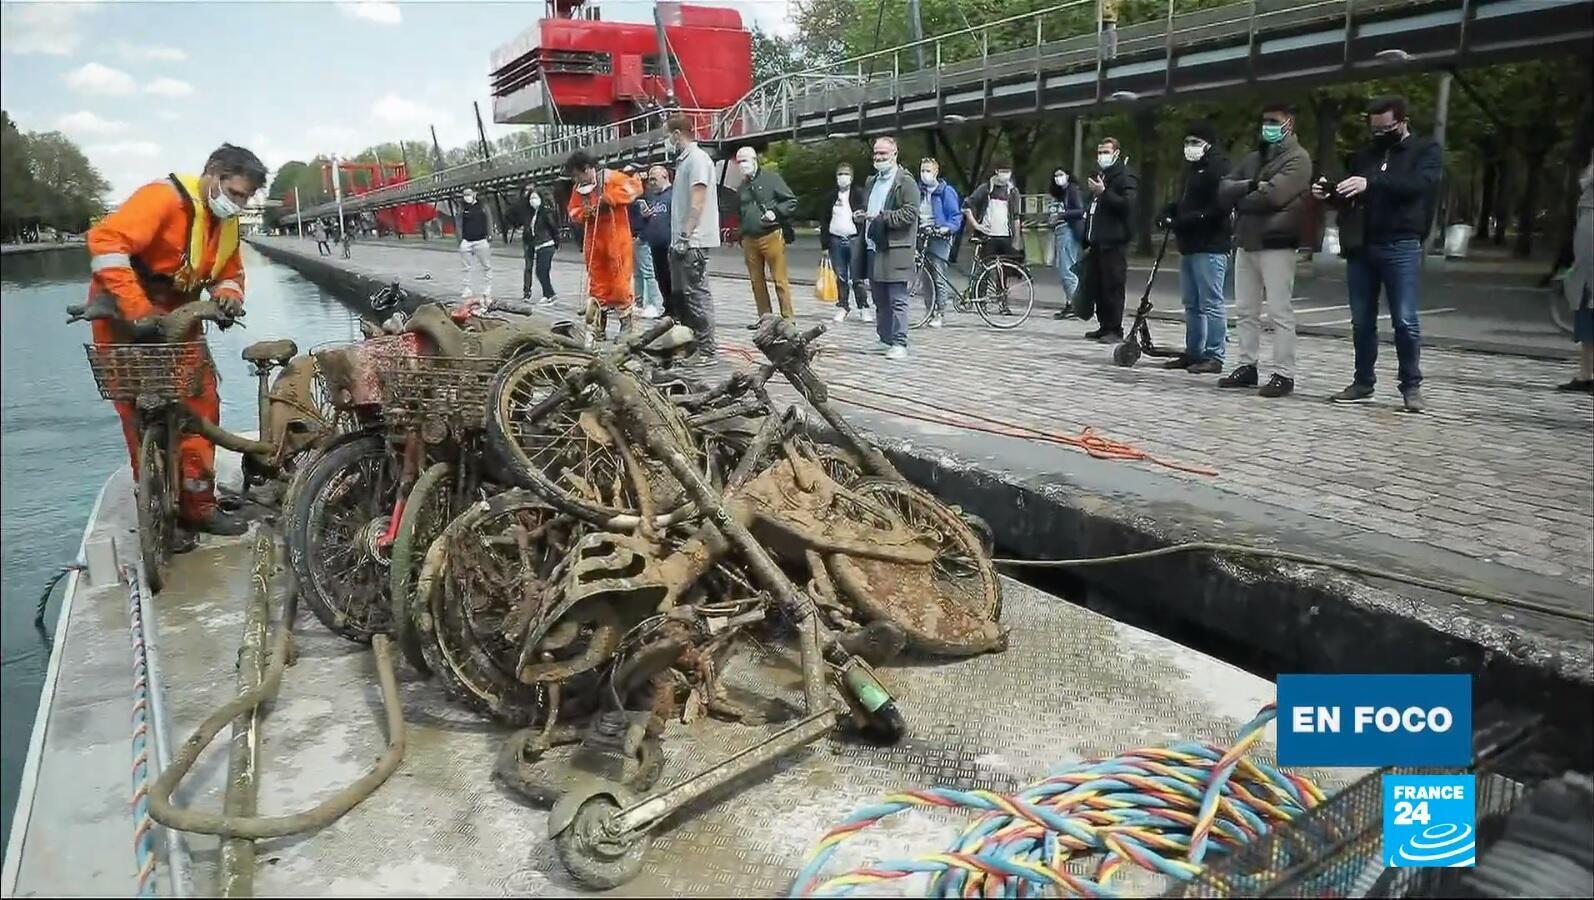 en foco - basura rio Sena París